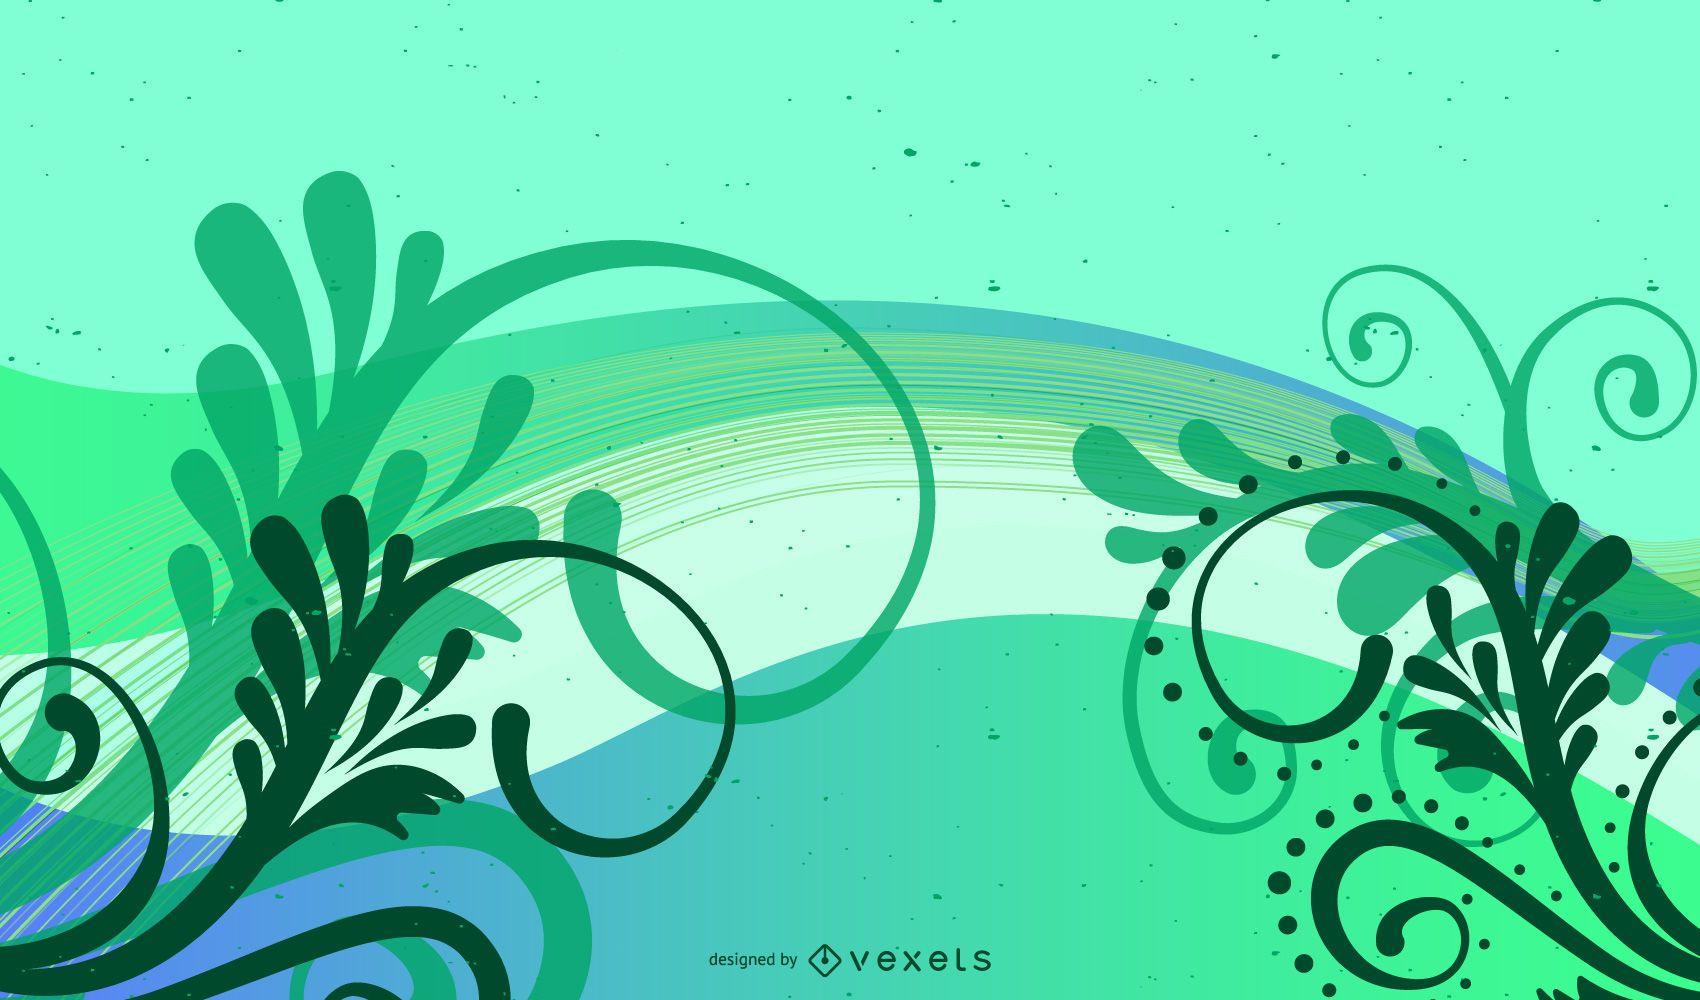 Abstract Organic Background Waves & Swirls